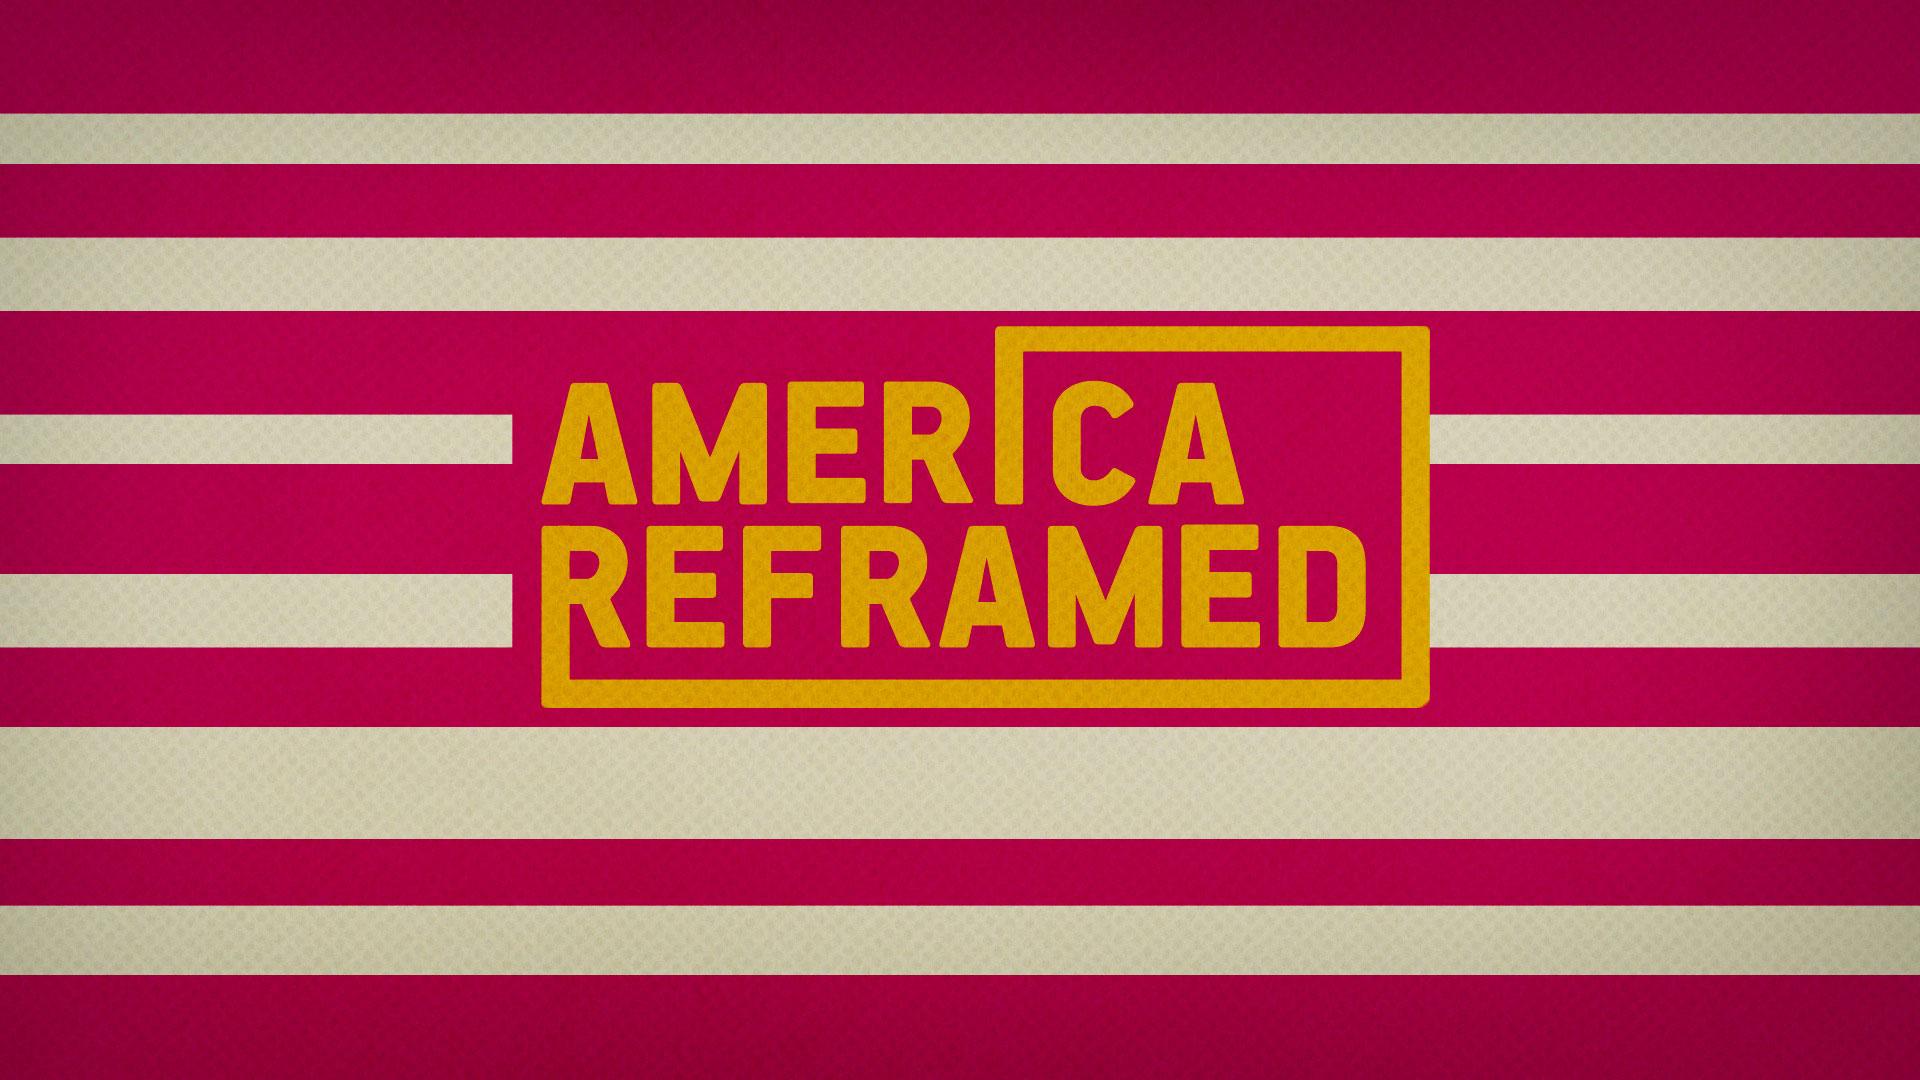 america_reframed_image-web.jpg